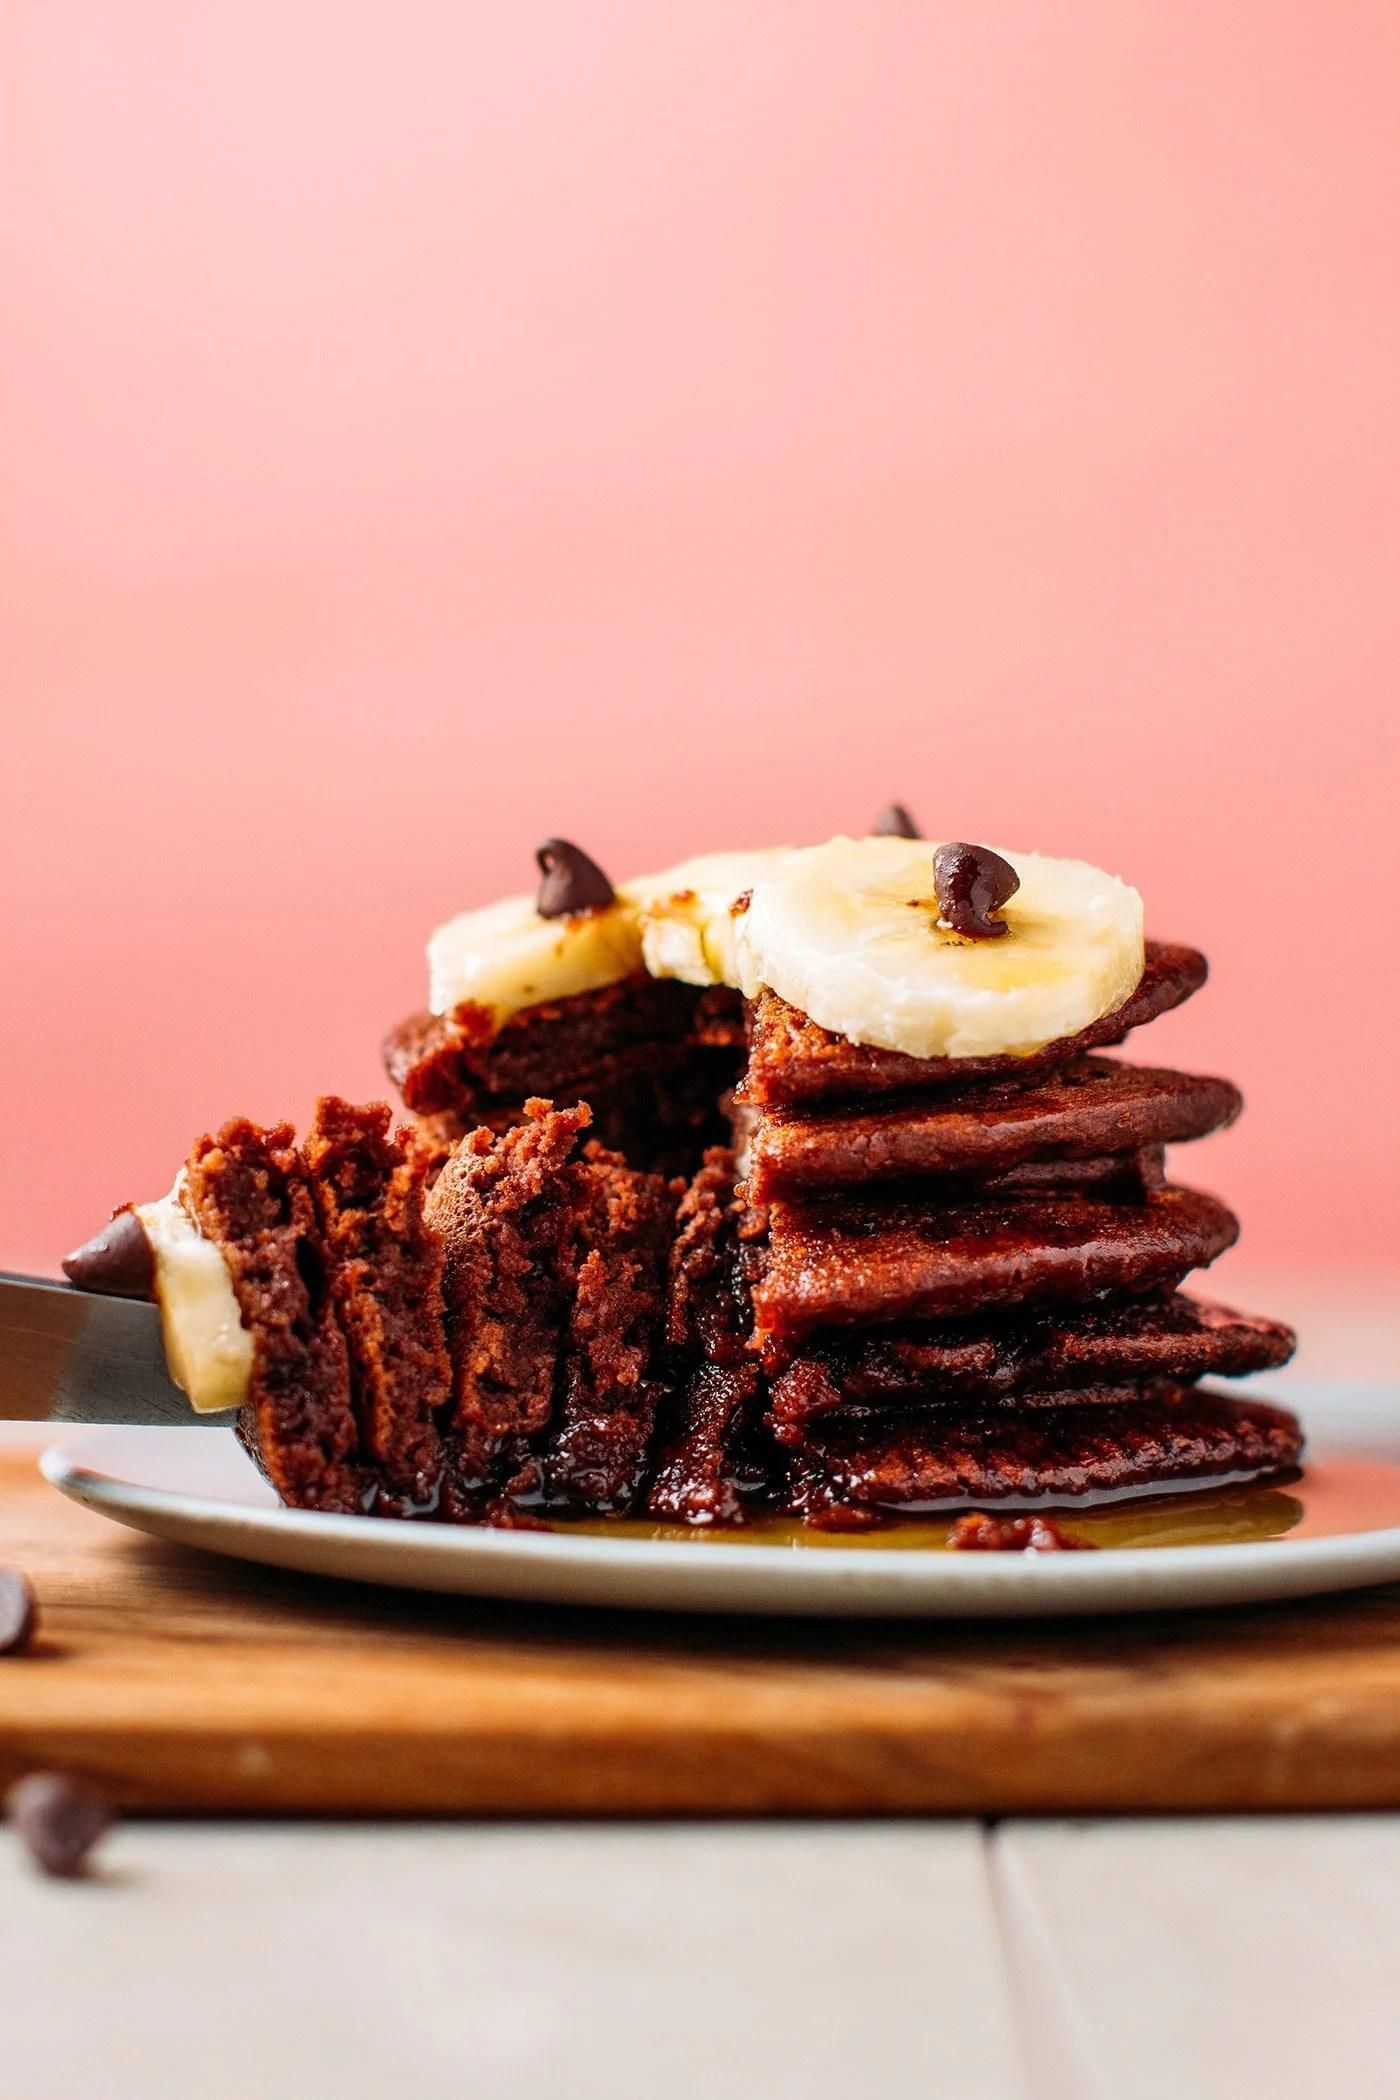 Chocolate Protein Pancakes (Vegan + GF + Sugar-Free)